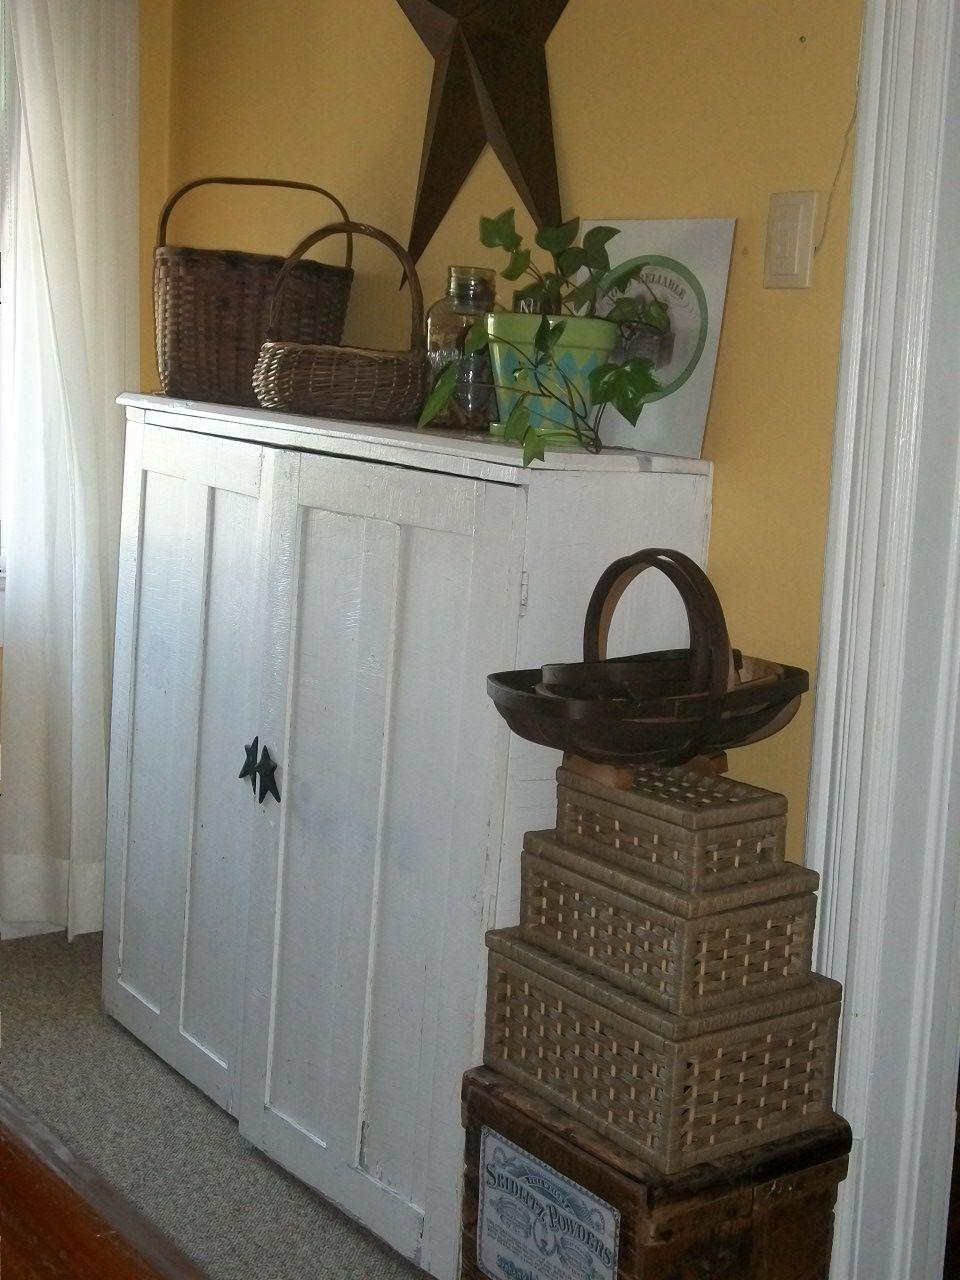 Interior Reuse Kitchen Cabinets best idea yet for reusing old kitchen cabinets use this the one up